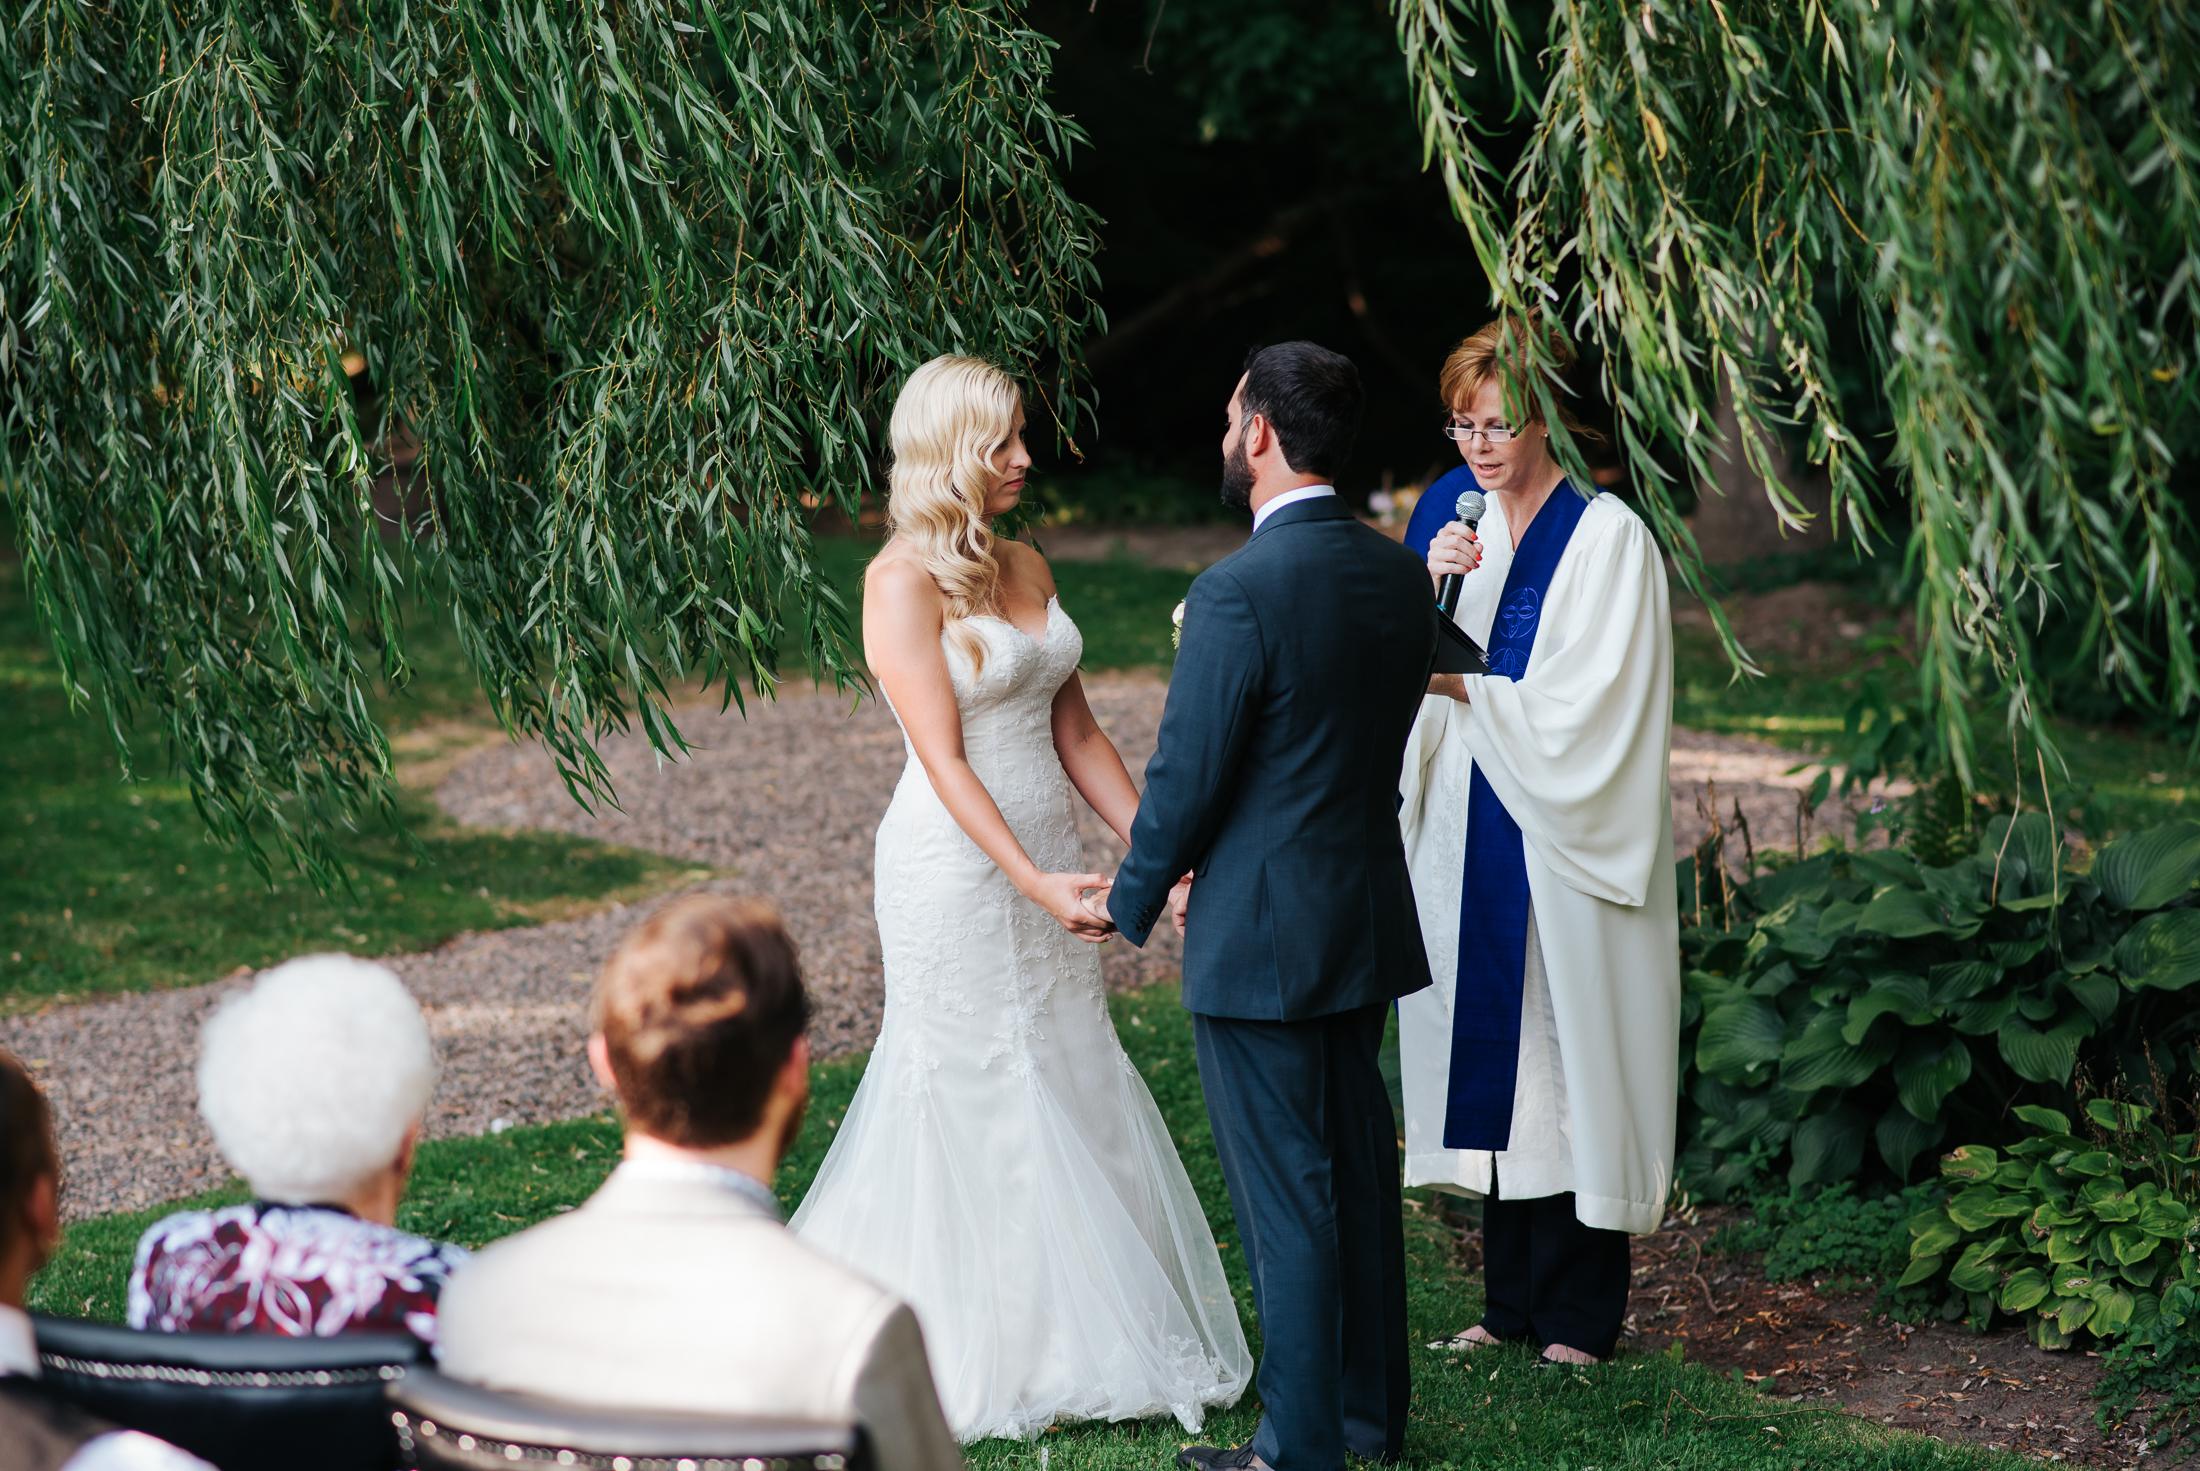 Wedding Ceremony at Harvest Restaurant, Brooklin Ontario